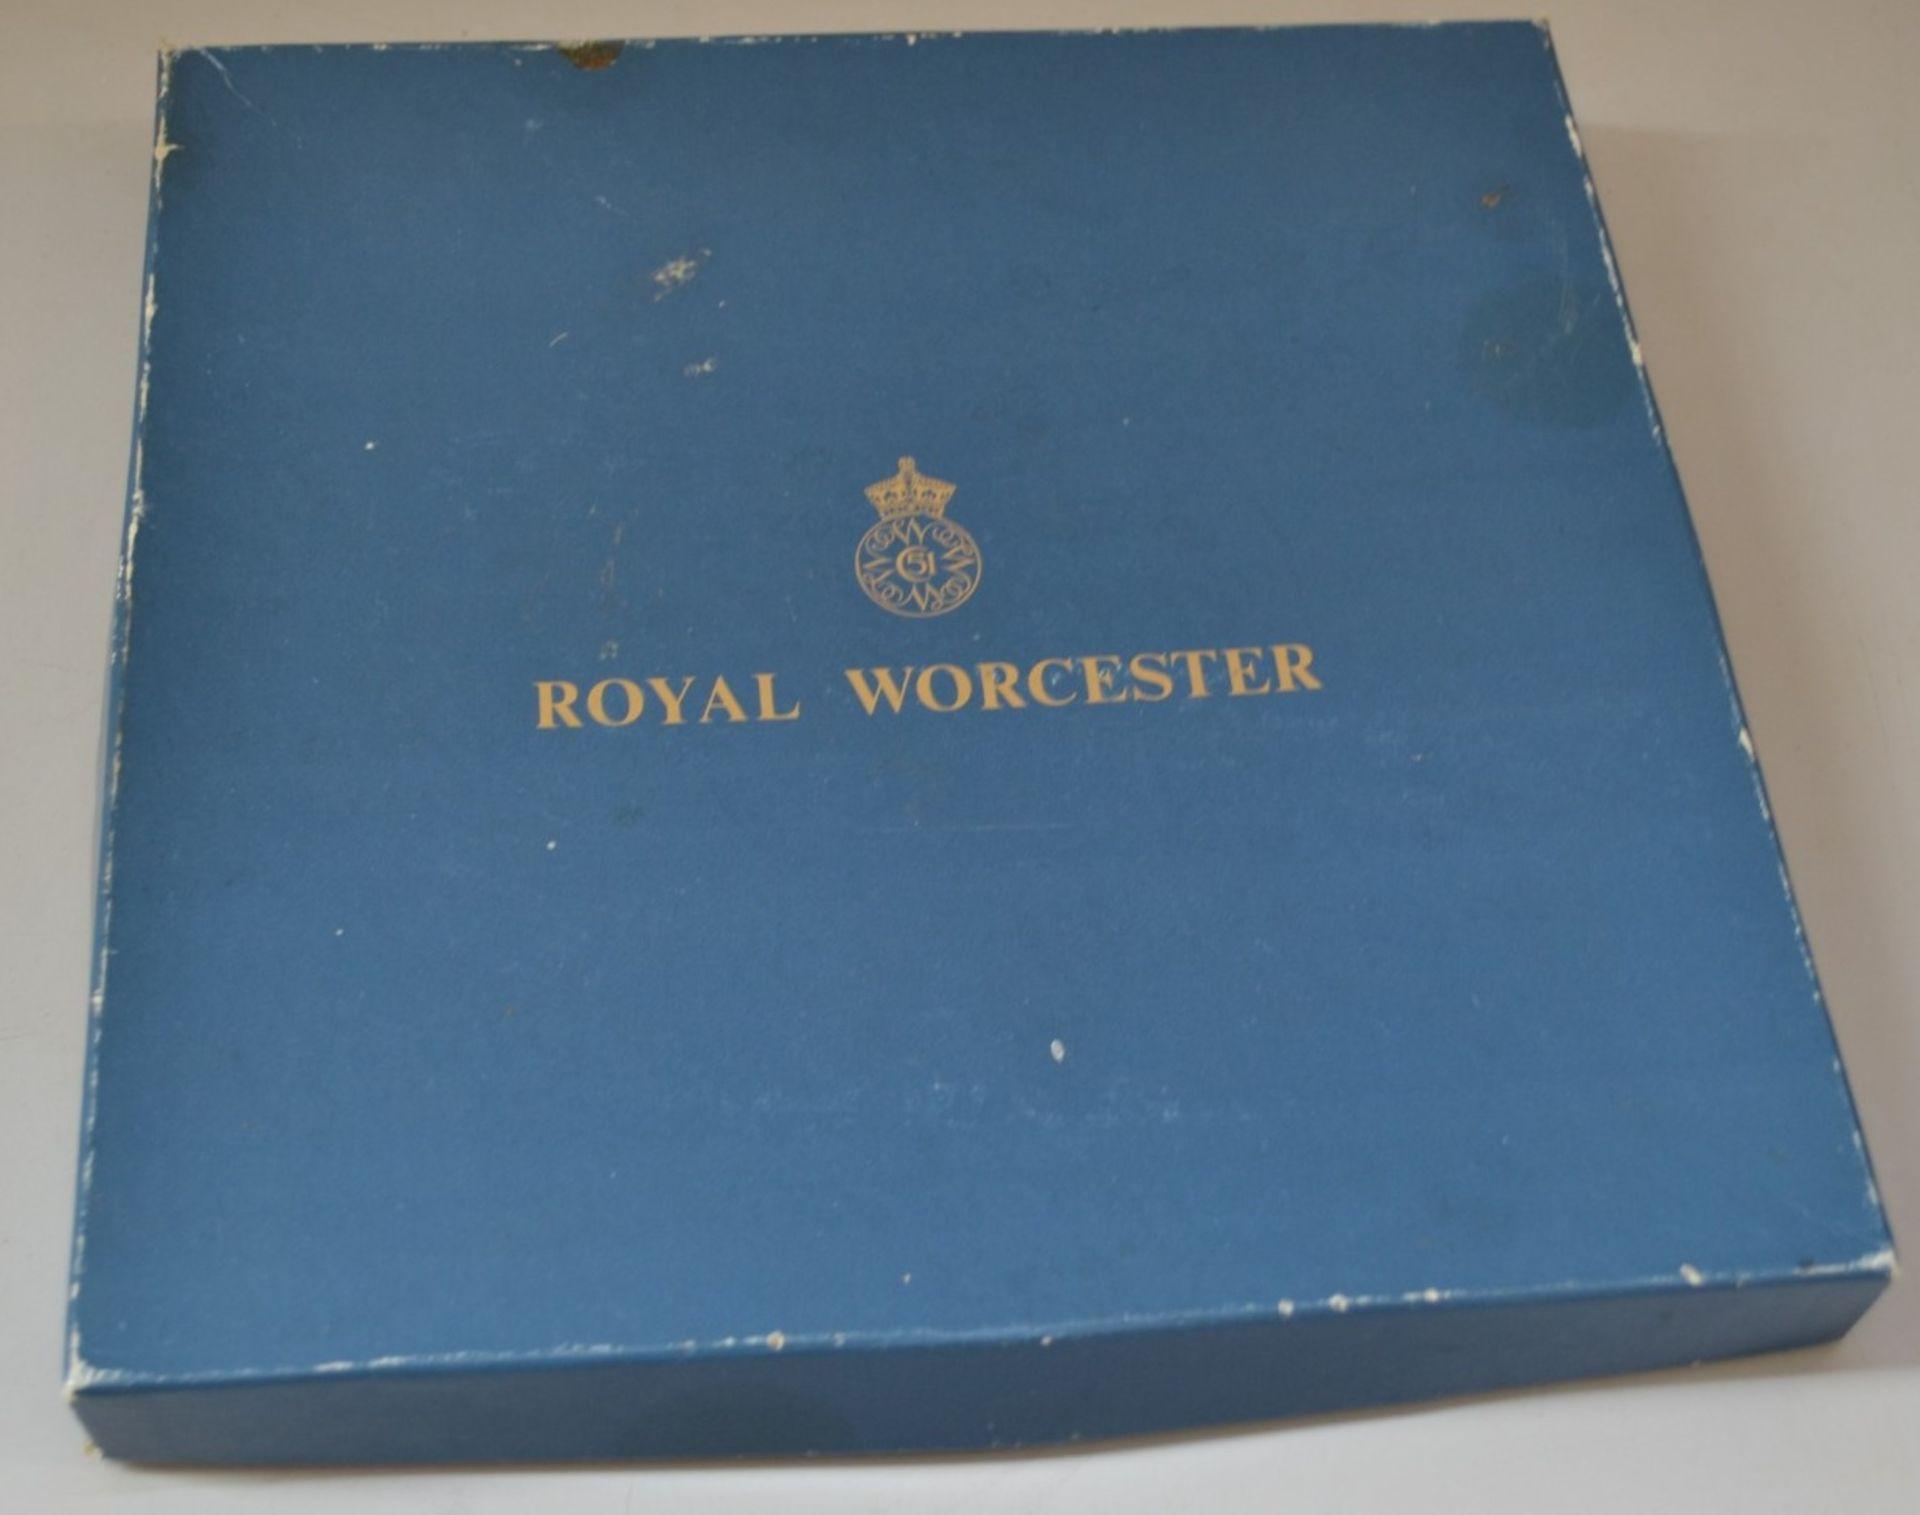 Lot 7402 - 1 x Royal Worcester Plate - Ref J2153 - CL314